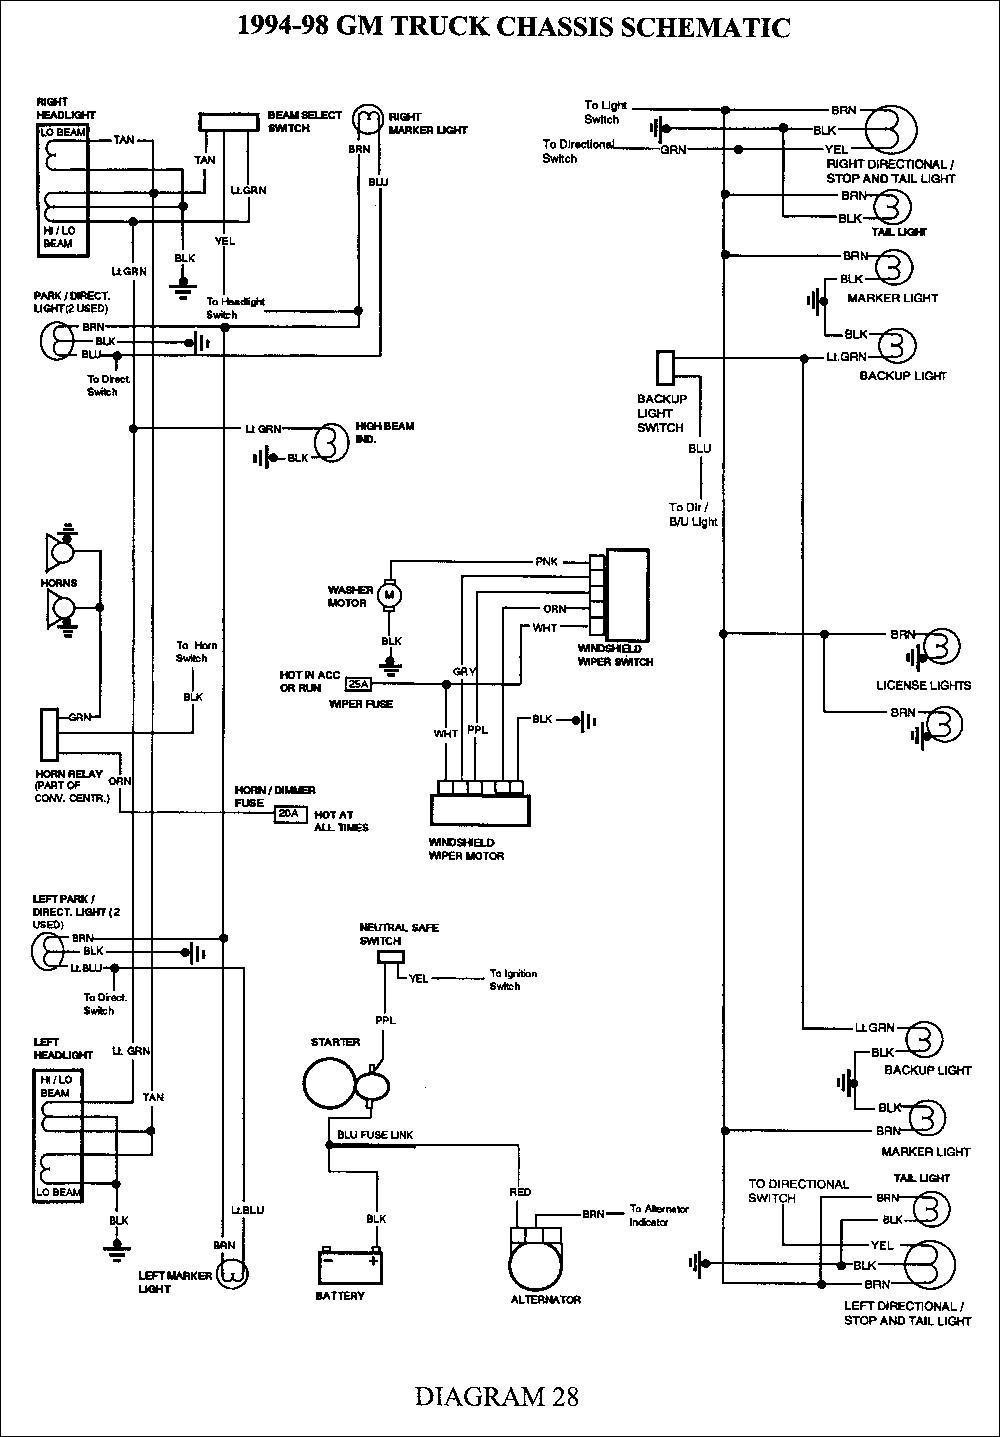 S10 Turn Signal Wiring Diagram - Wiring Diagrams Hubs - 1995 Chevy Silverado Wiring Diagram